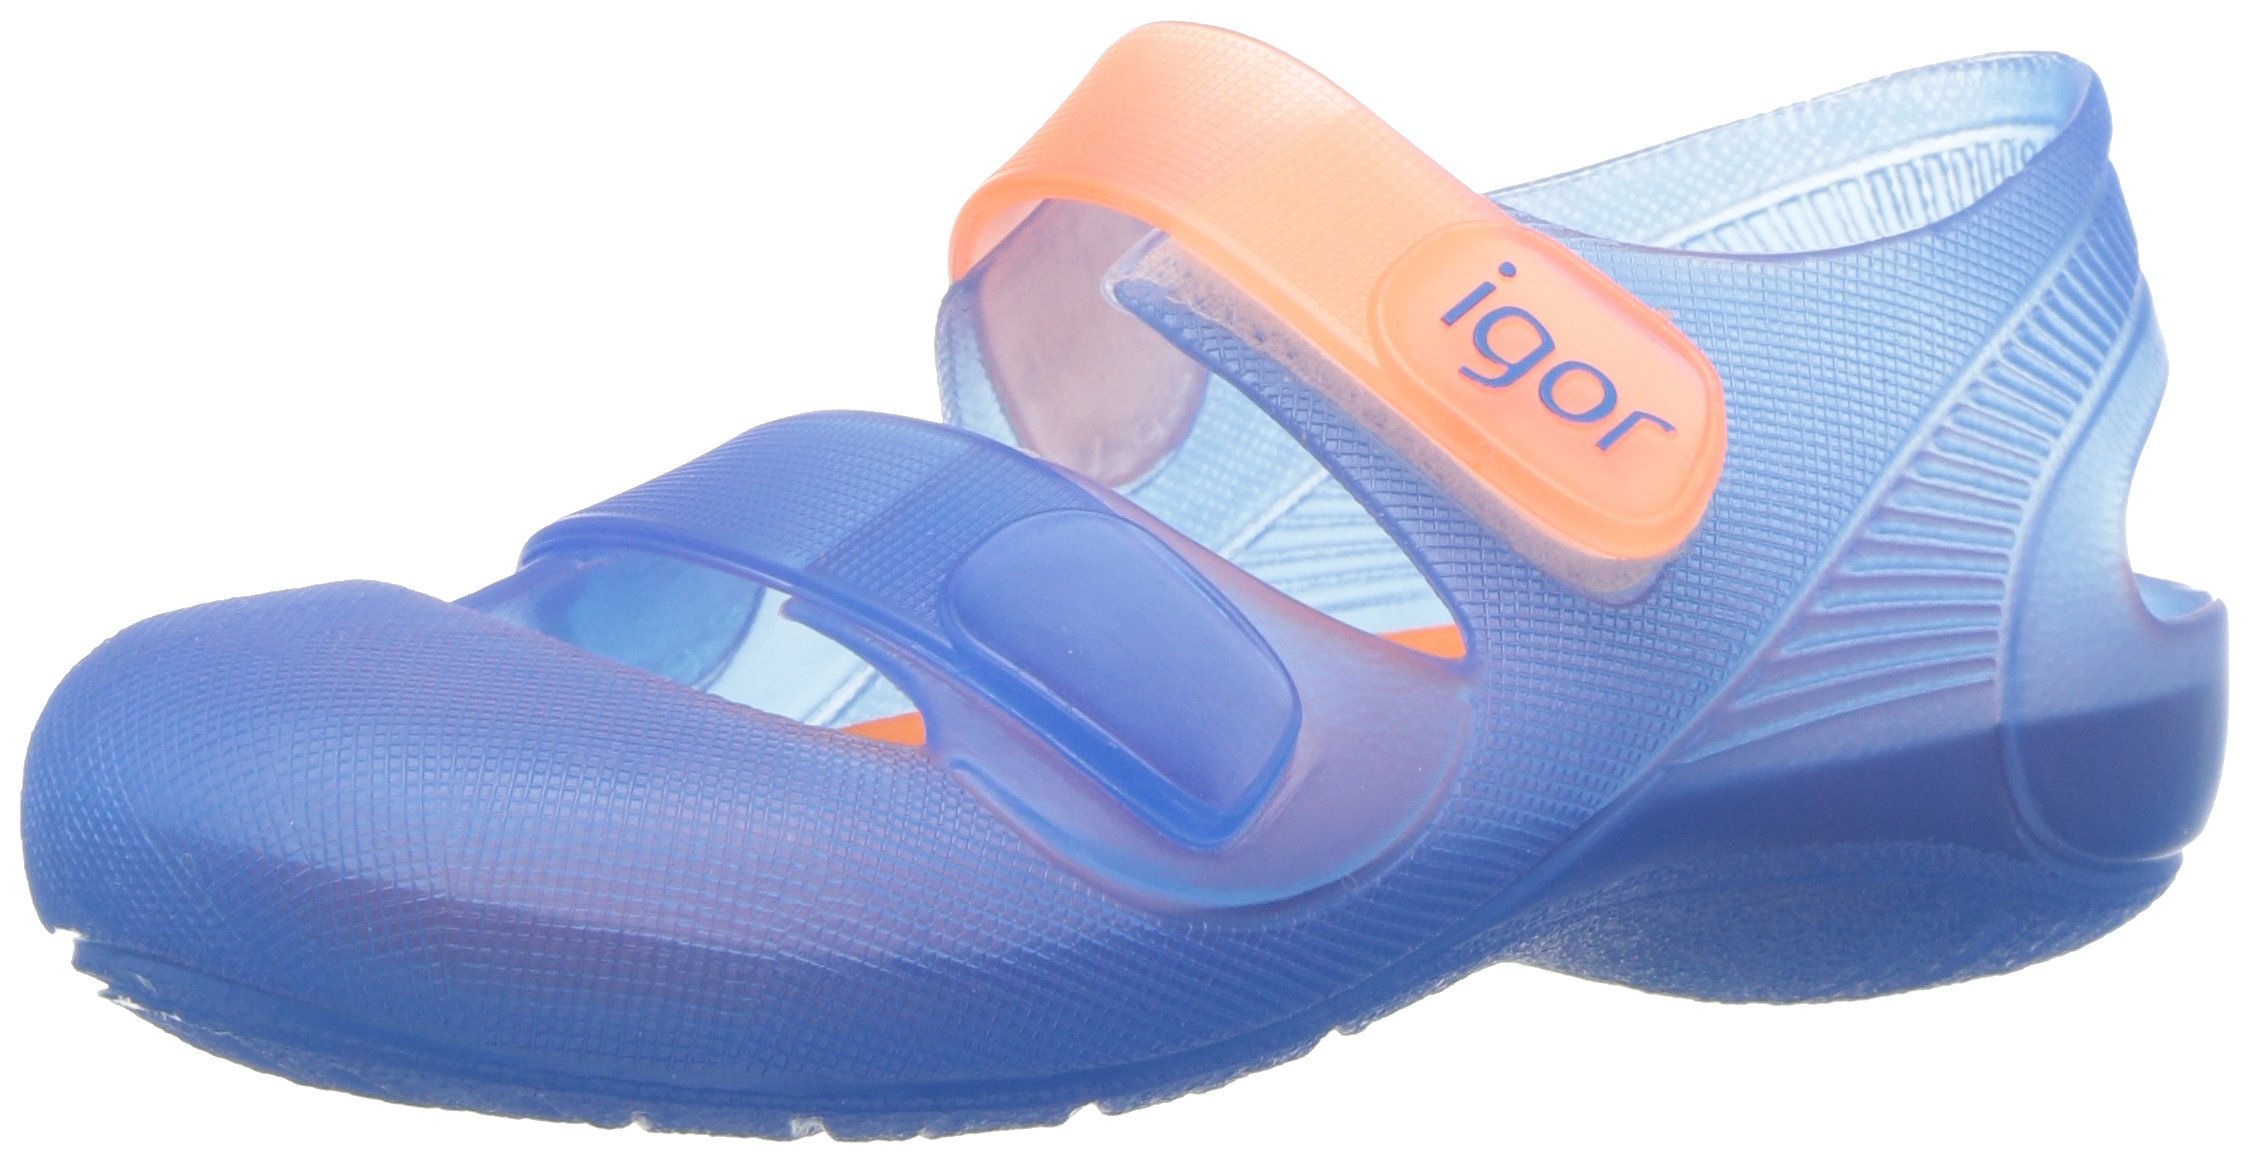 Igor Boys' S10146 Bondi Sandal, Light Blue/Orange, 25 M EU/8 M US Toddler